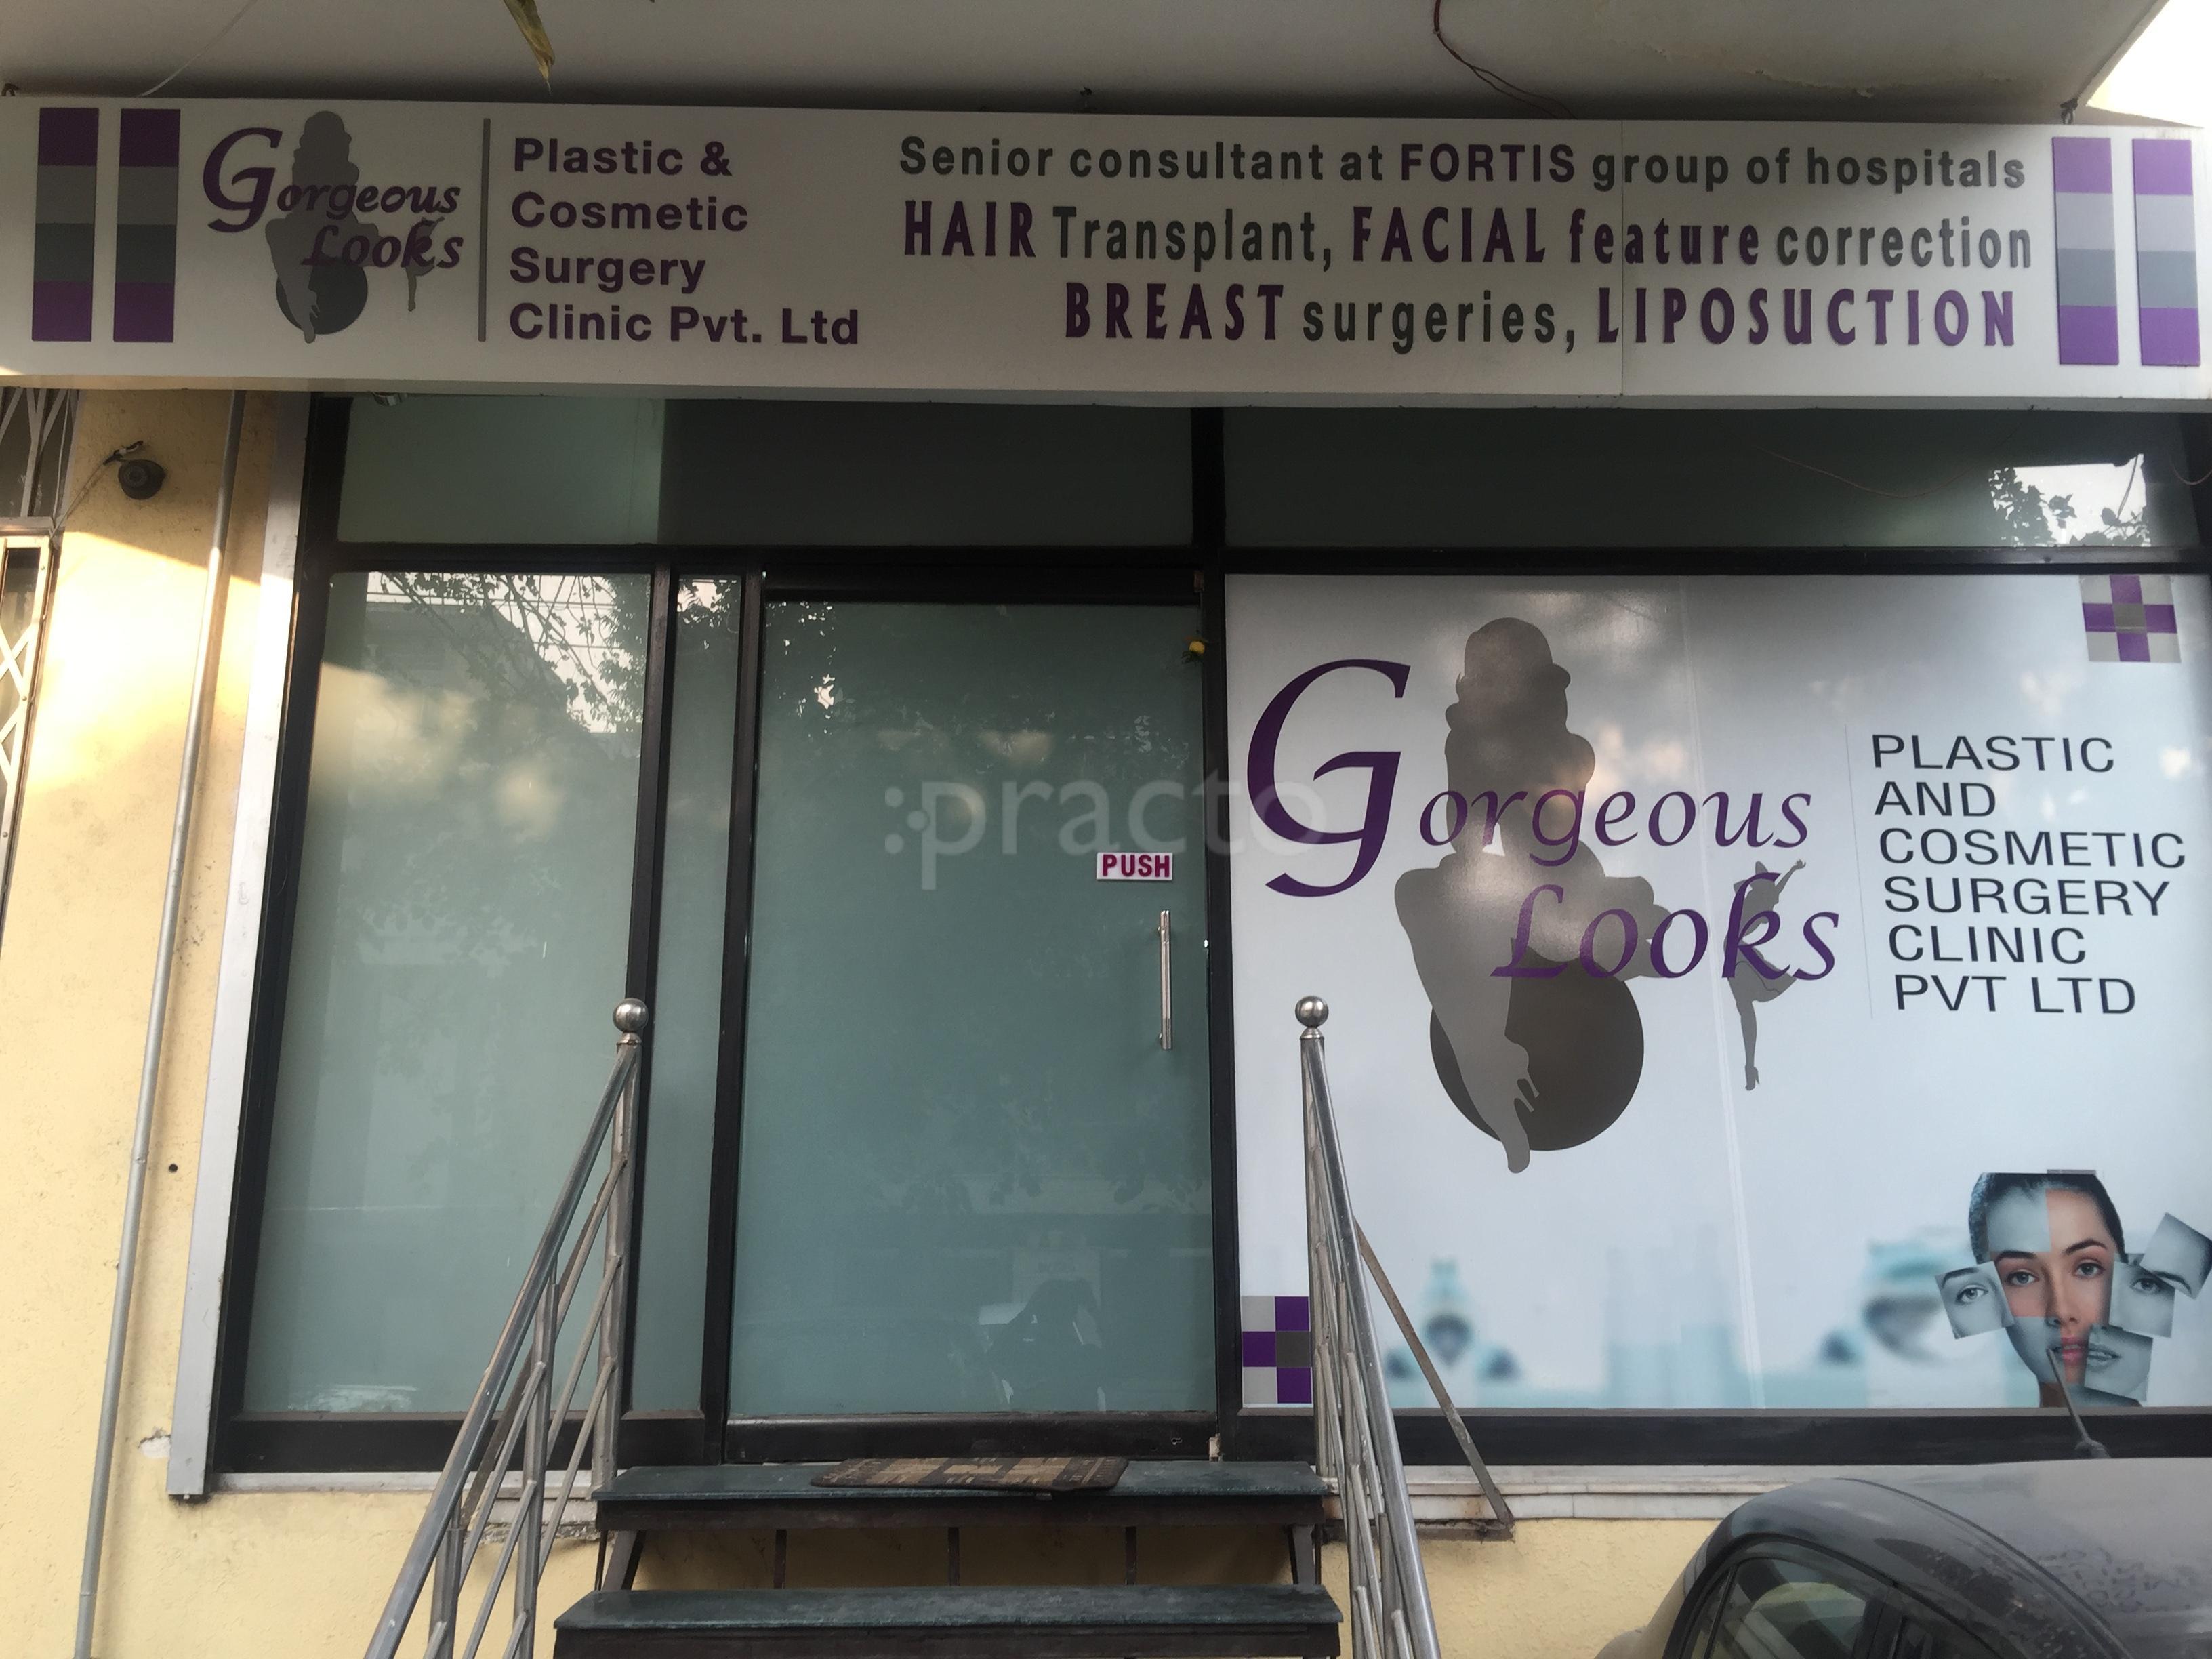 Gorzeous Looks Cosmetic / Plastic Surgery & Hair Transplant Centre